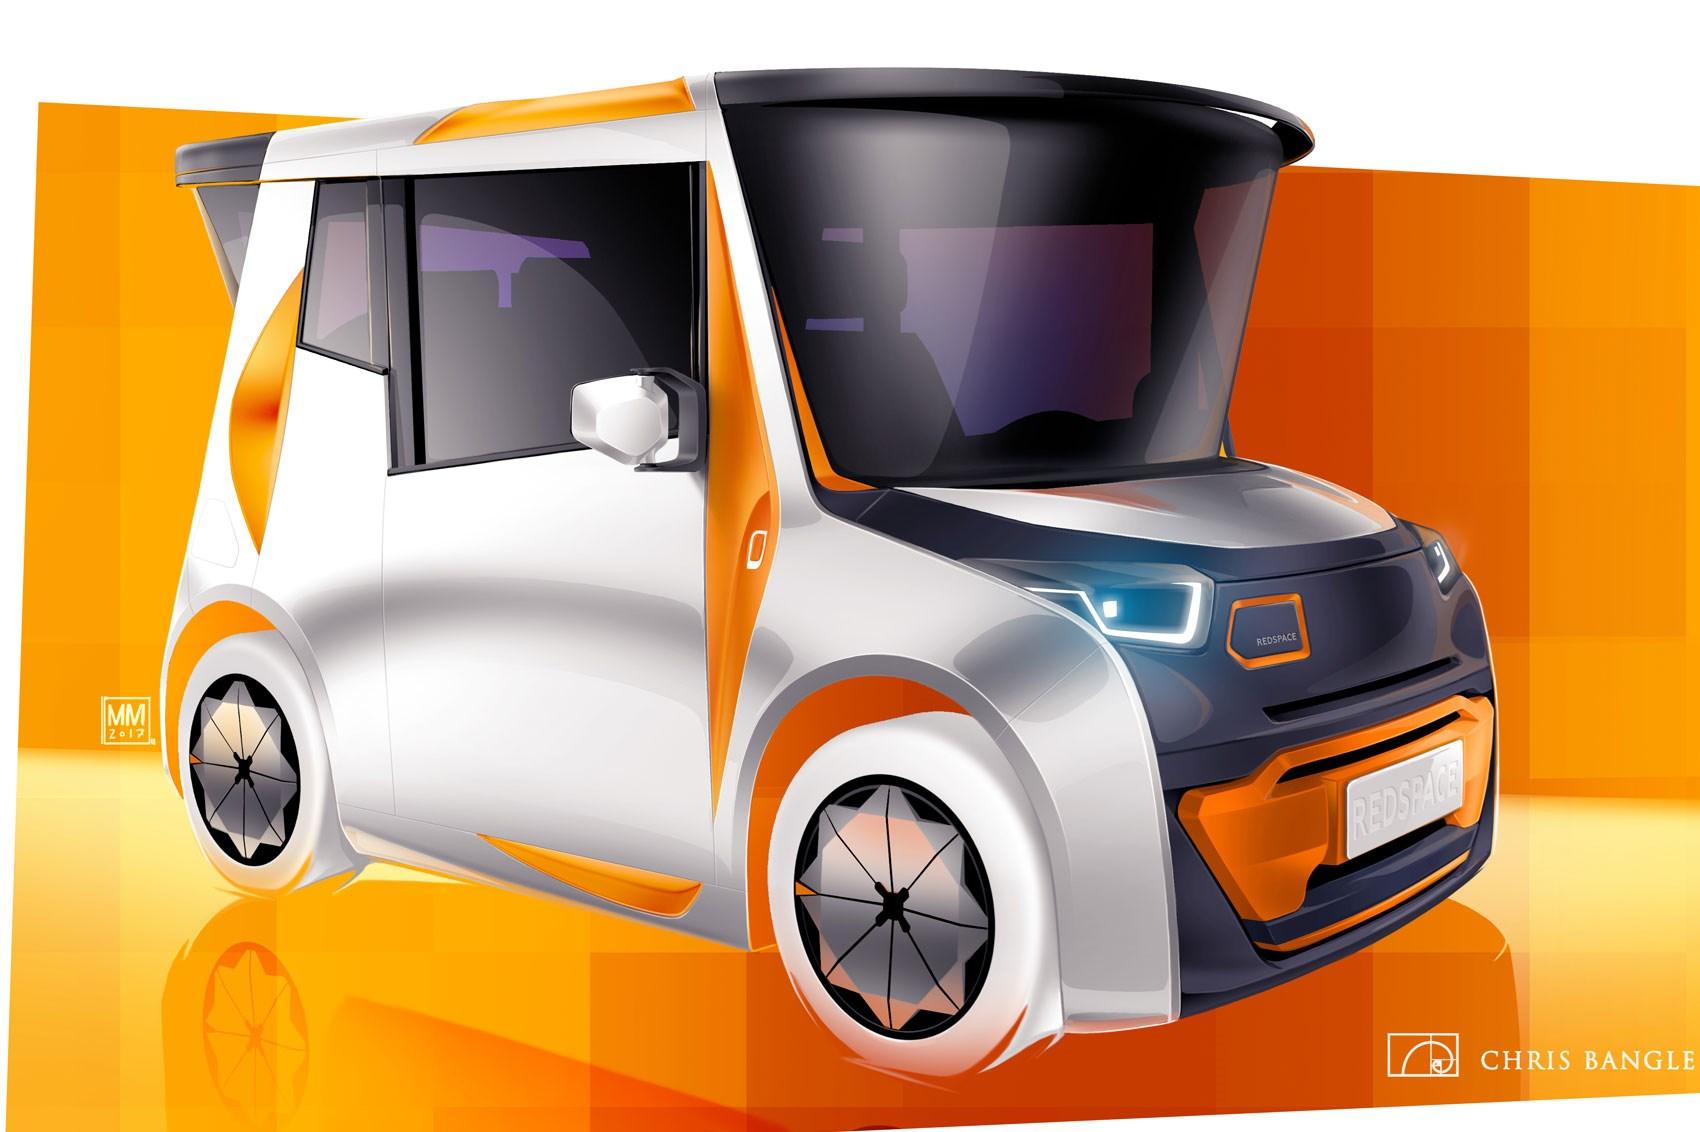 Chris Bangle Right Is An Automotive Design Maverick